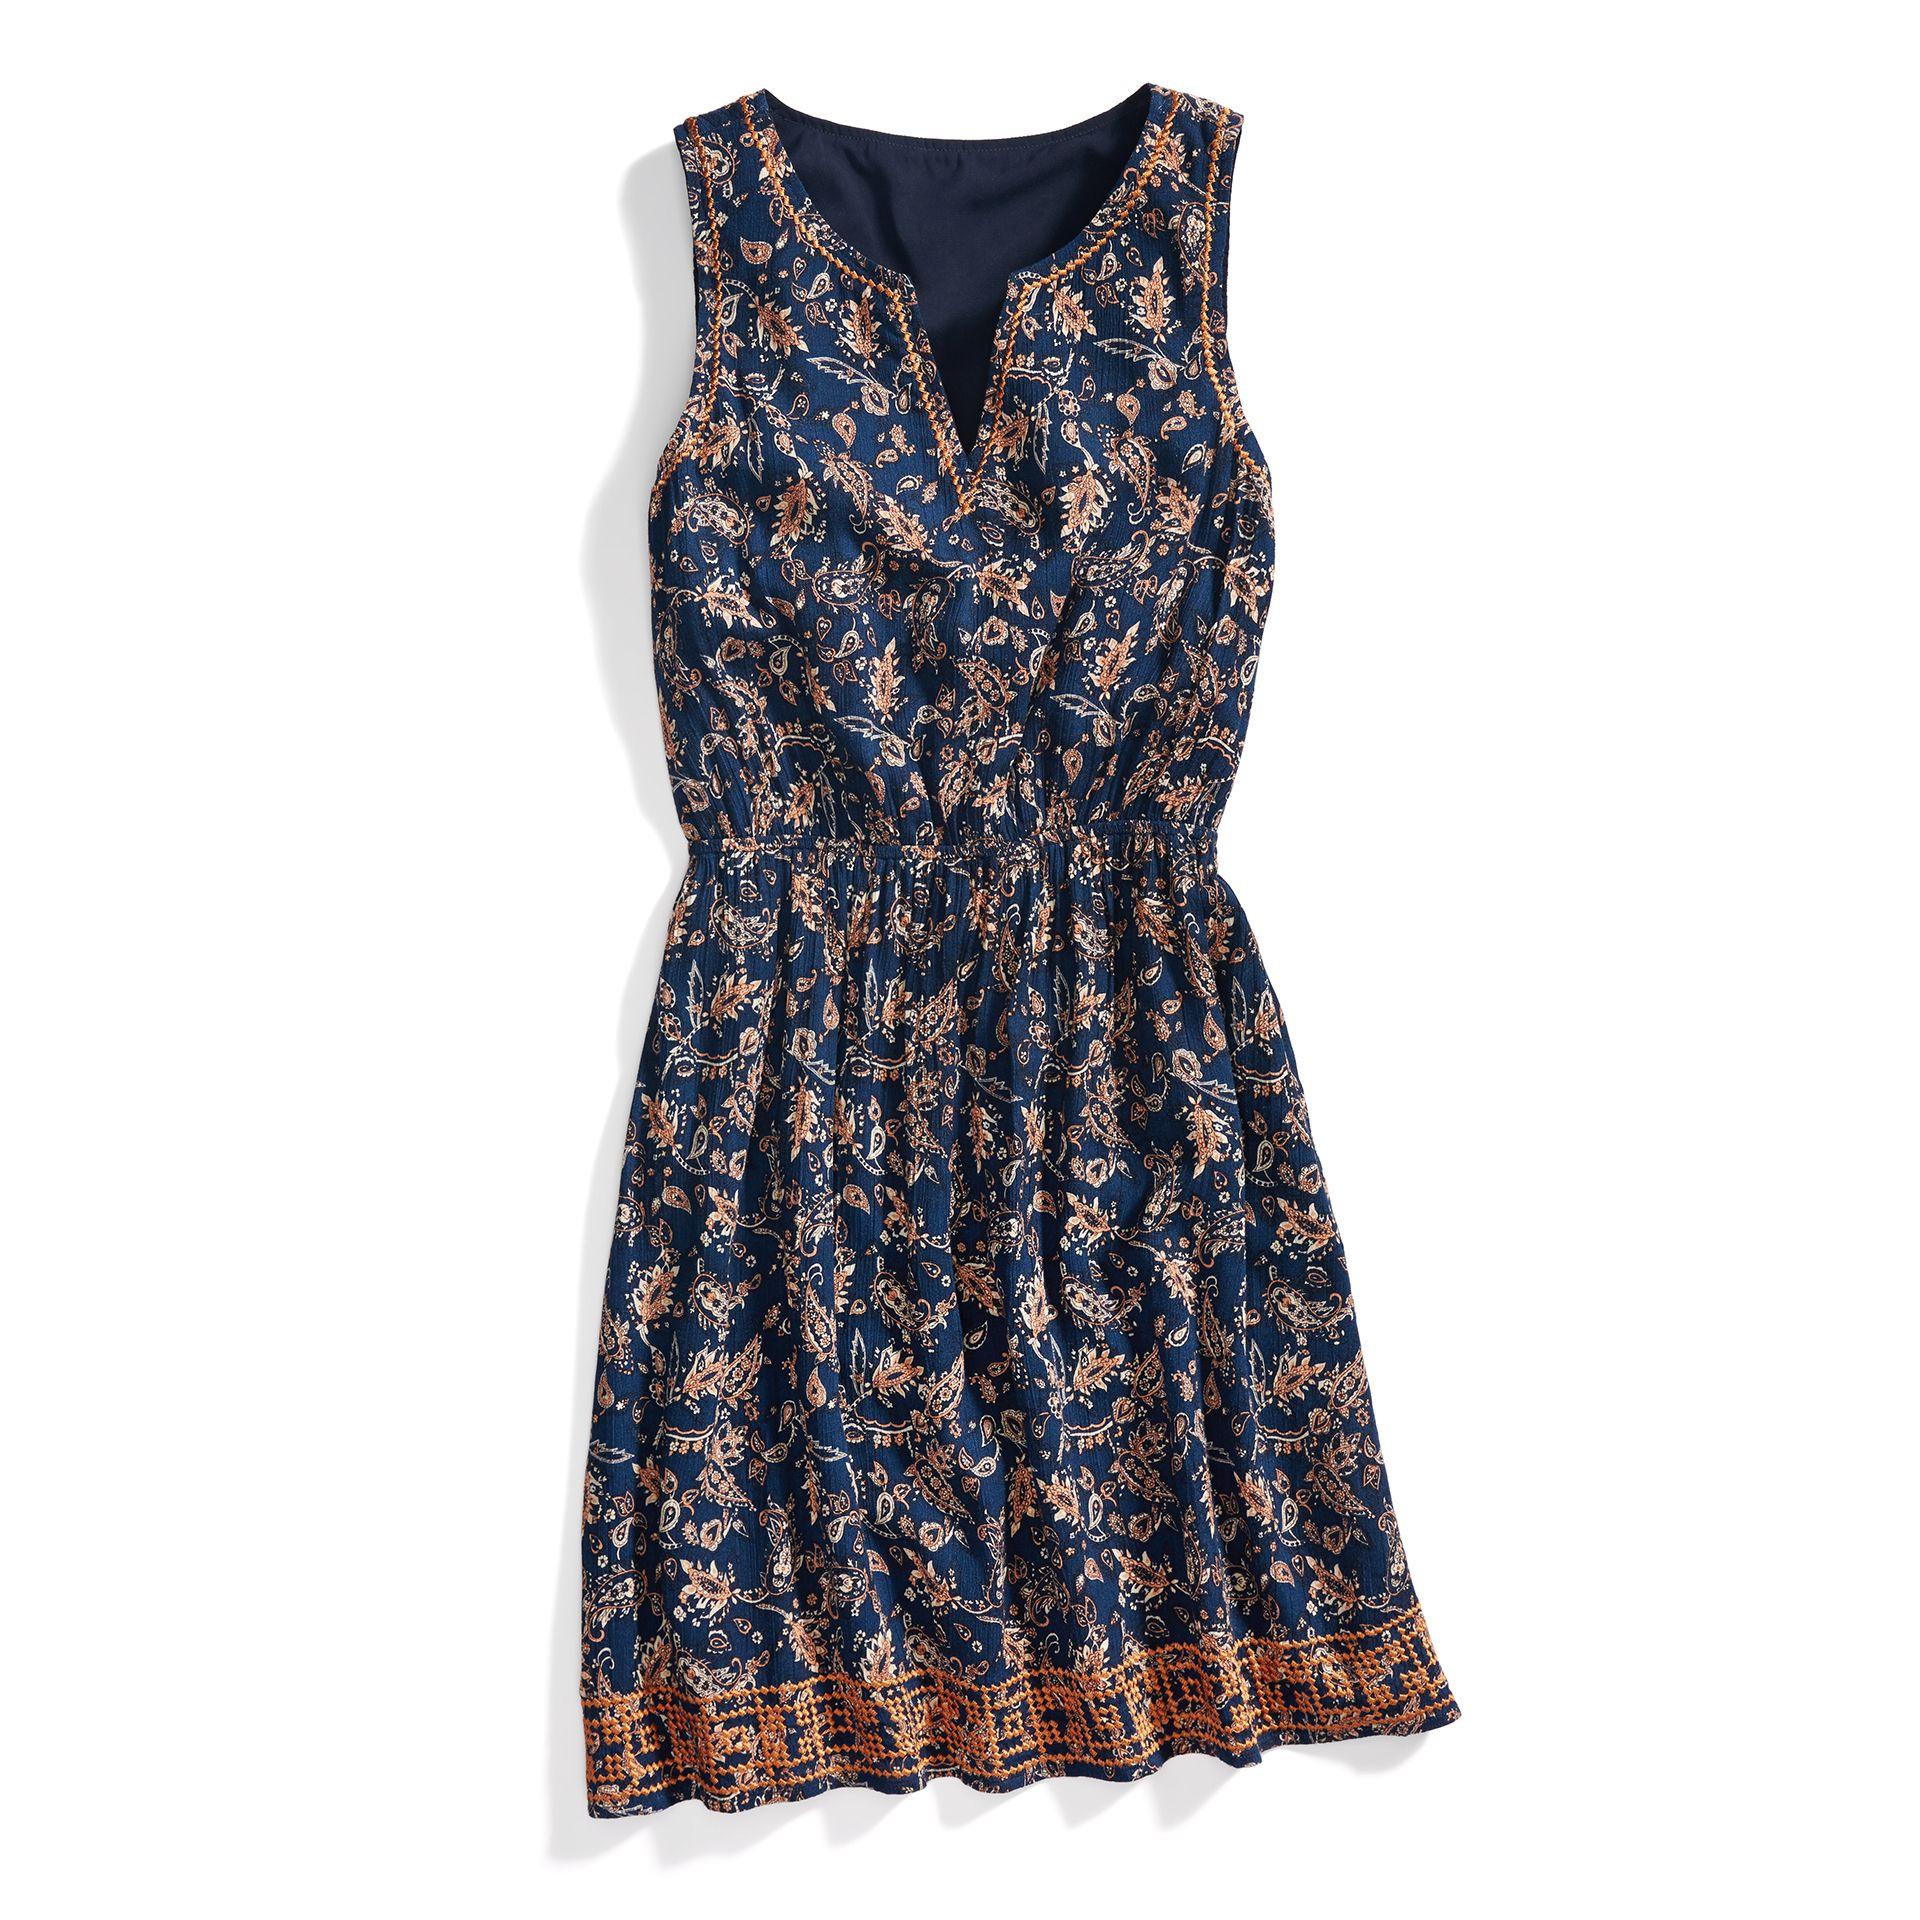 aa9e6ad87a3d Stitch Fix Boho Style  Printed Sundress